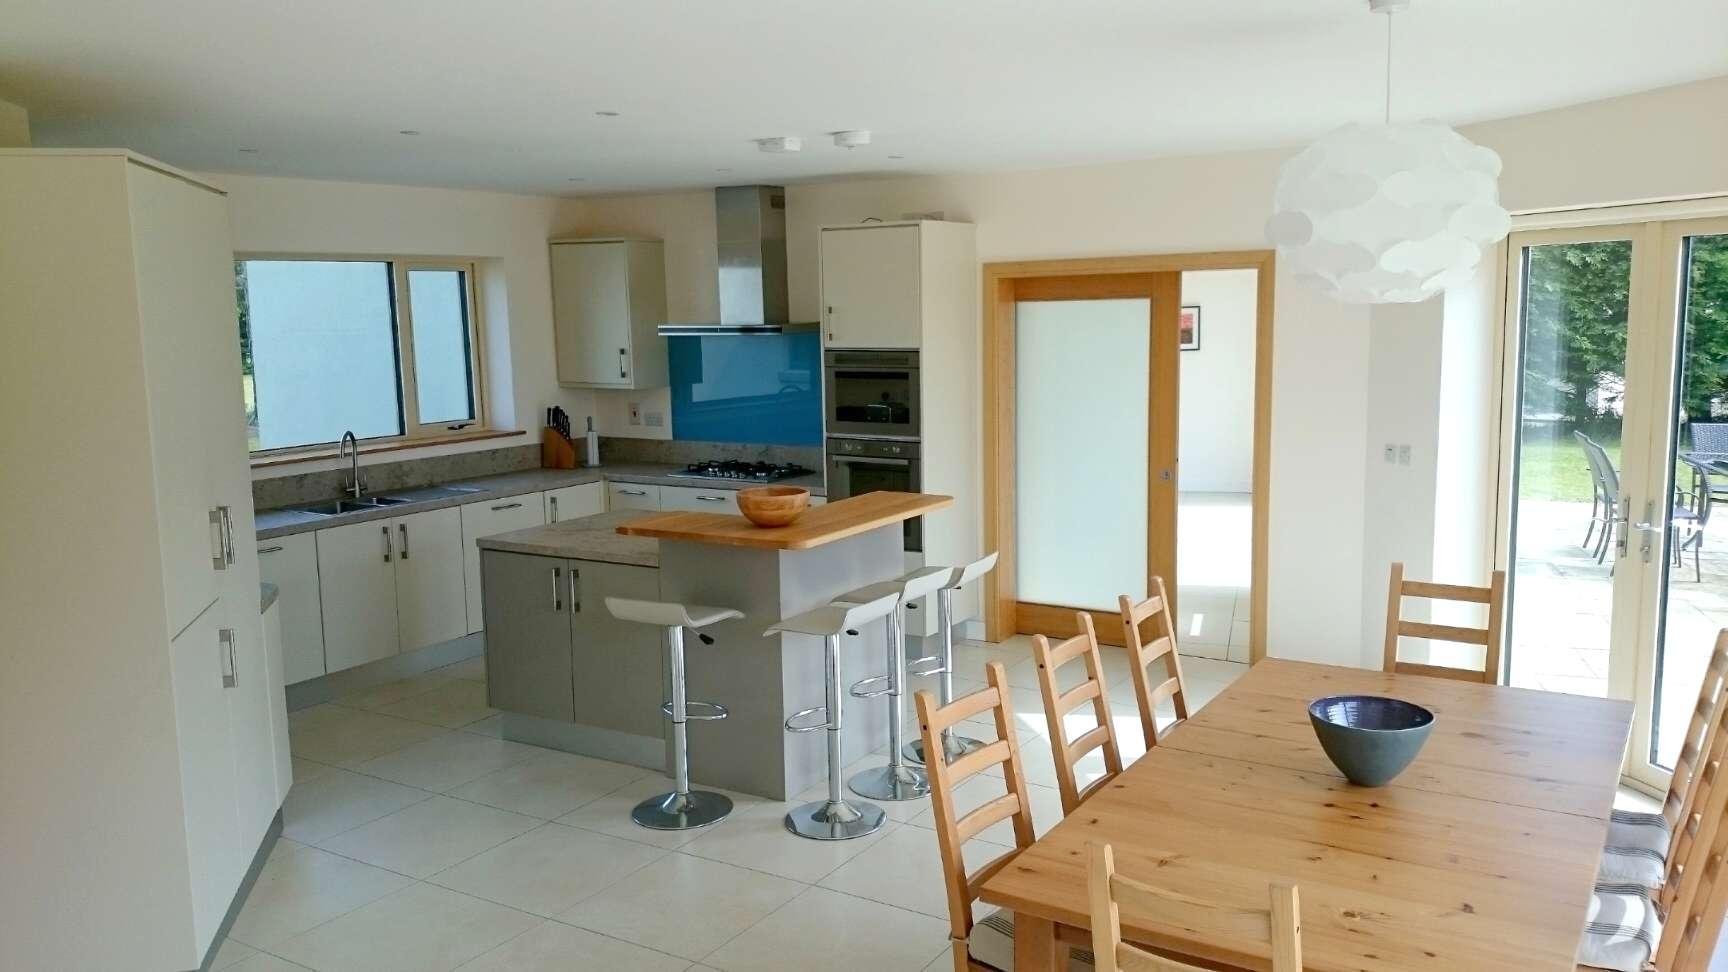 2 Storey flat roofed dwelling Wexford